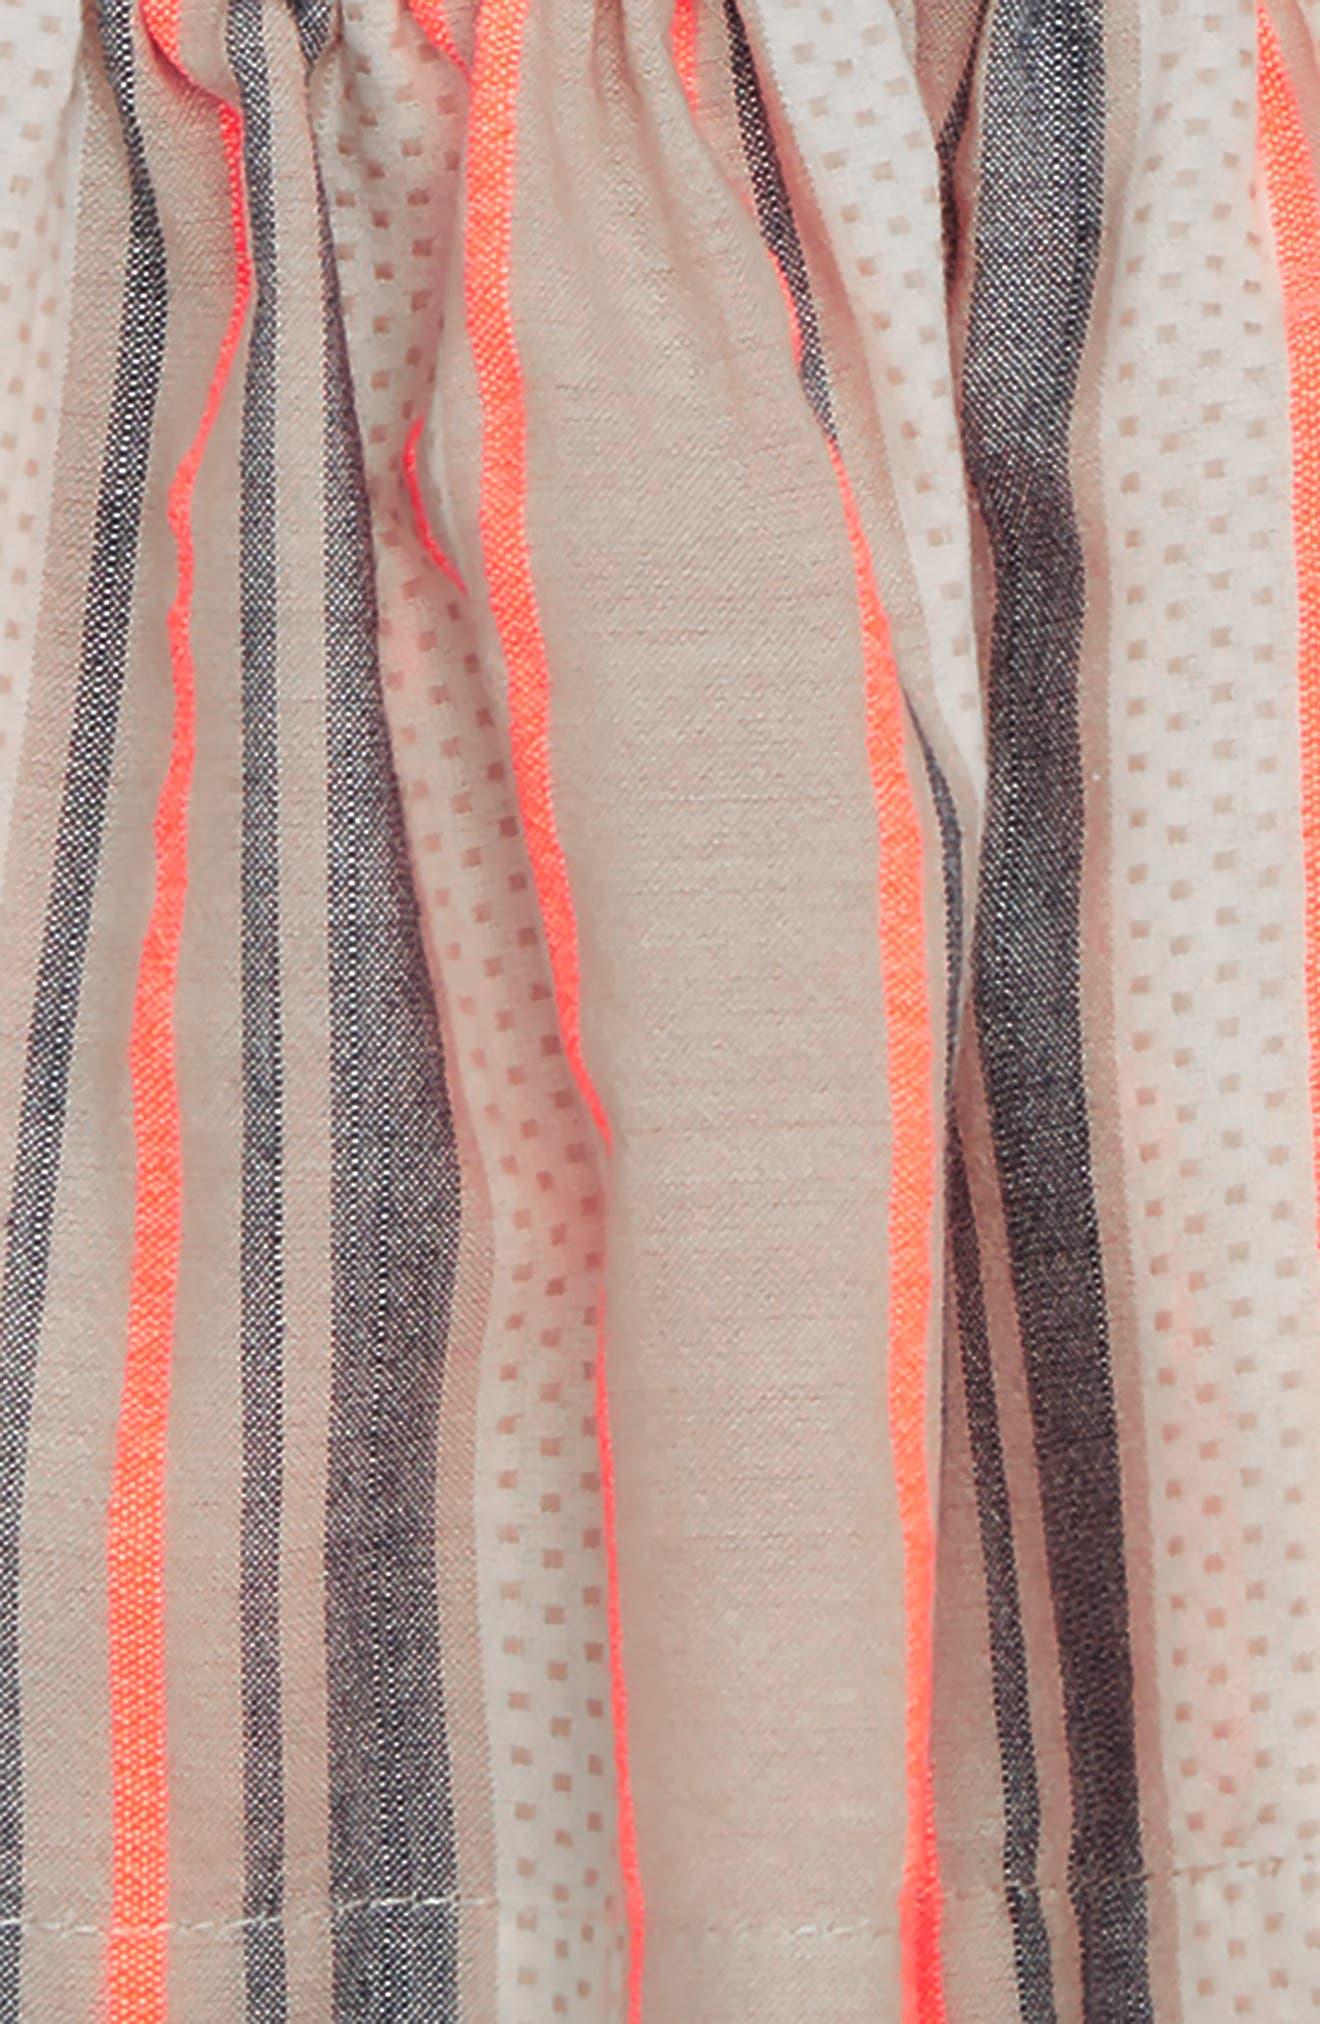 Woven Stripe Swing Top & Bubble Shorts Set,                             Alternate thumbnail 2, color,                             Pink Cloud Multi Stripe